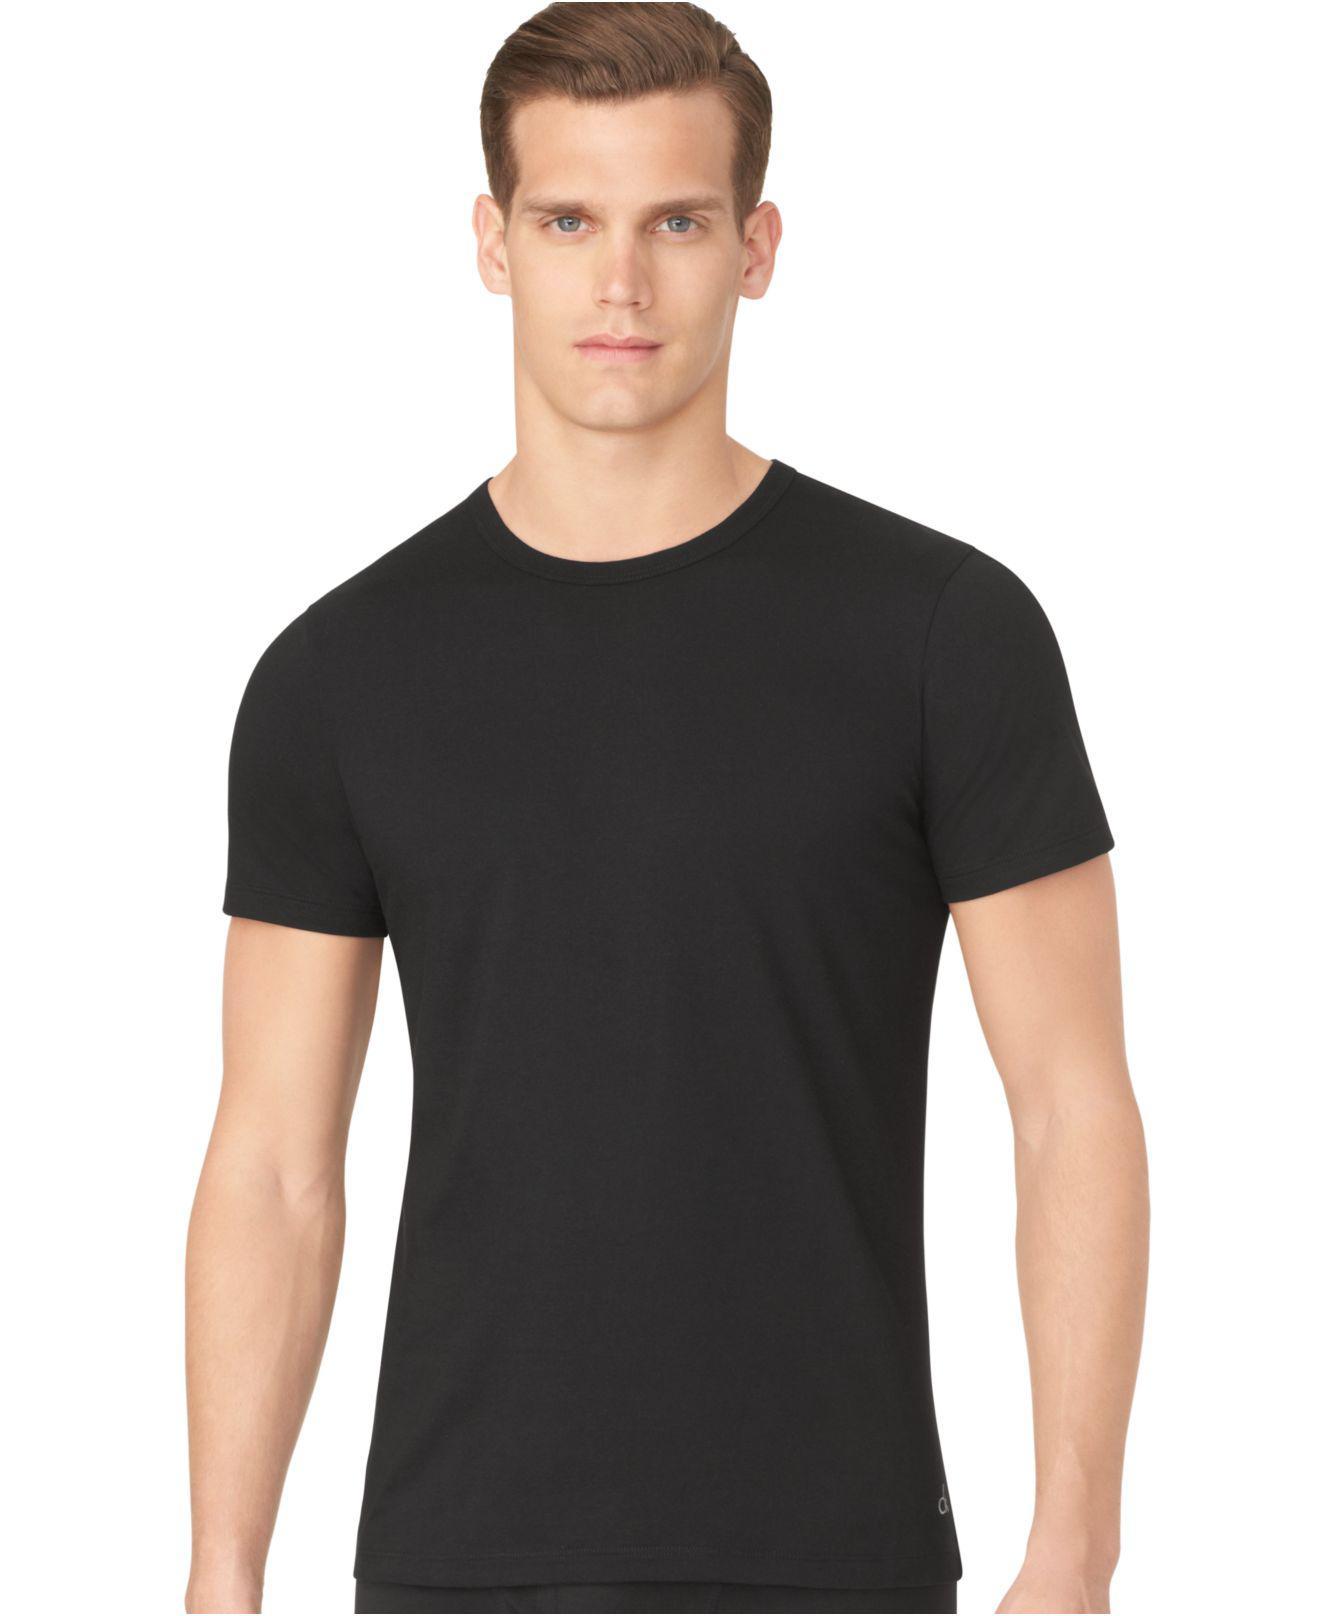 Discounts Cheap Price Sale Best Wholesale Mens Cotton Baseball T-Shirt CALVIN KLEIN 205W39NYC 100% Authentic Online UOU3U9002